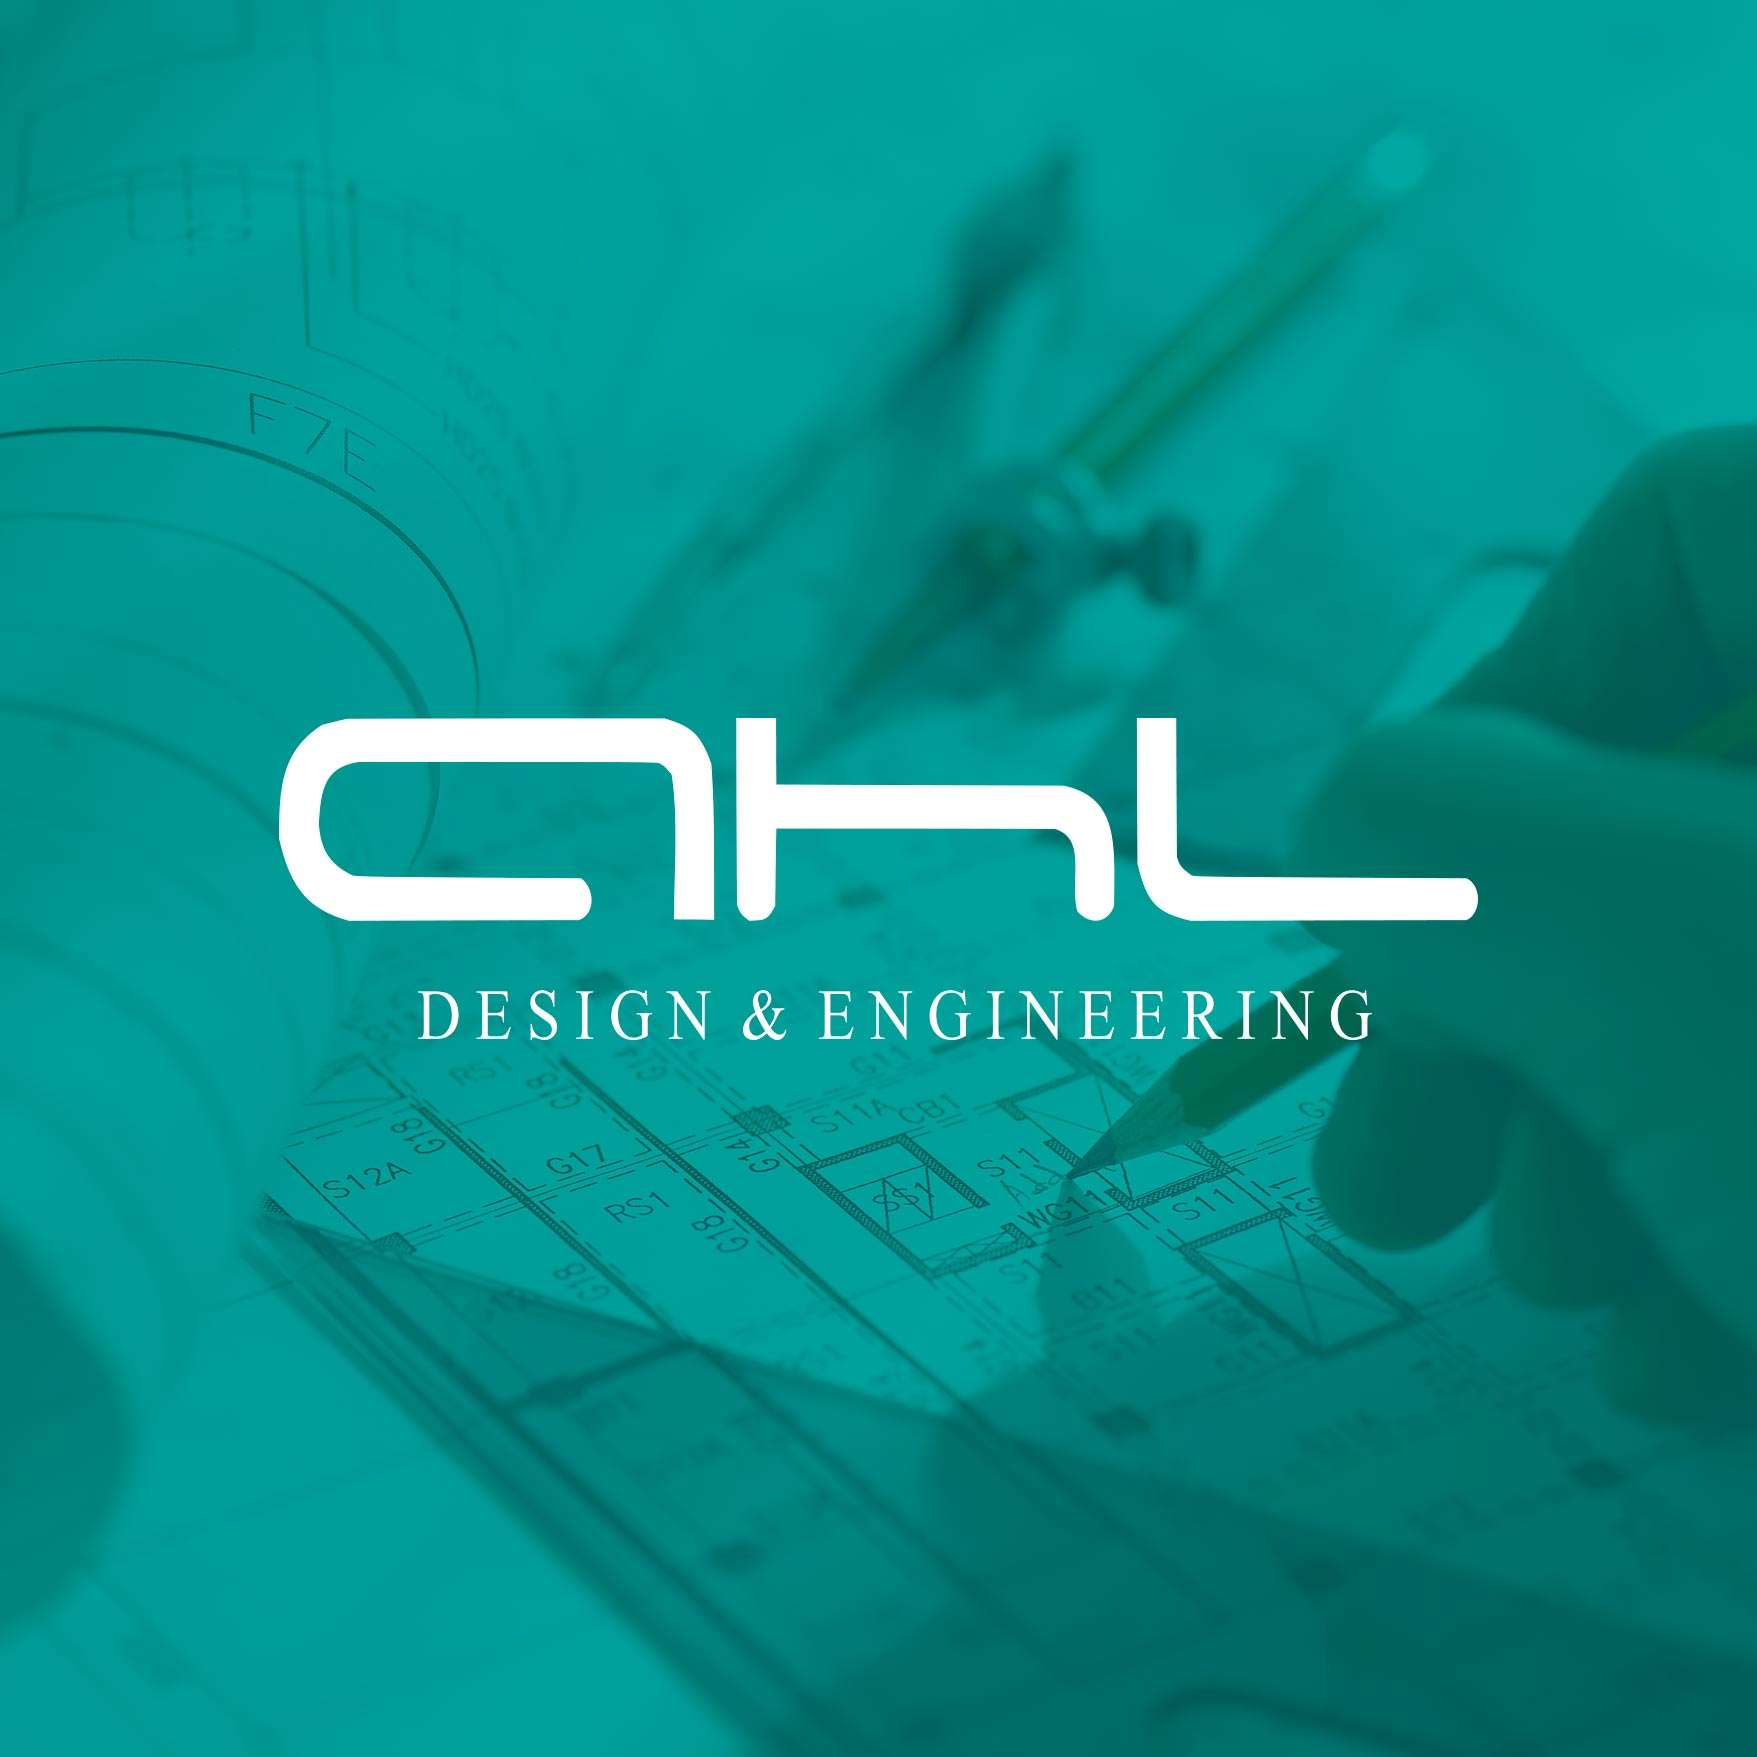 AHL Design&Engineering : Web design & développement